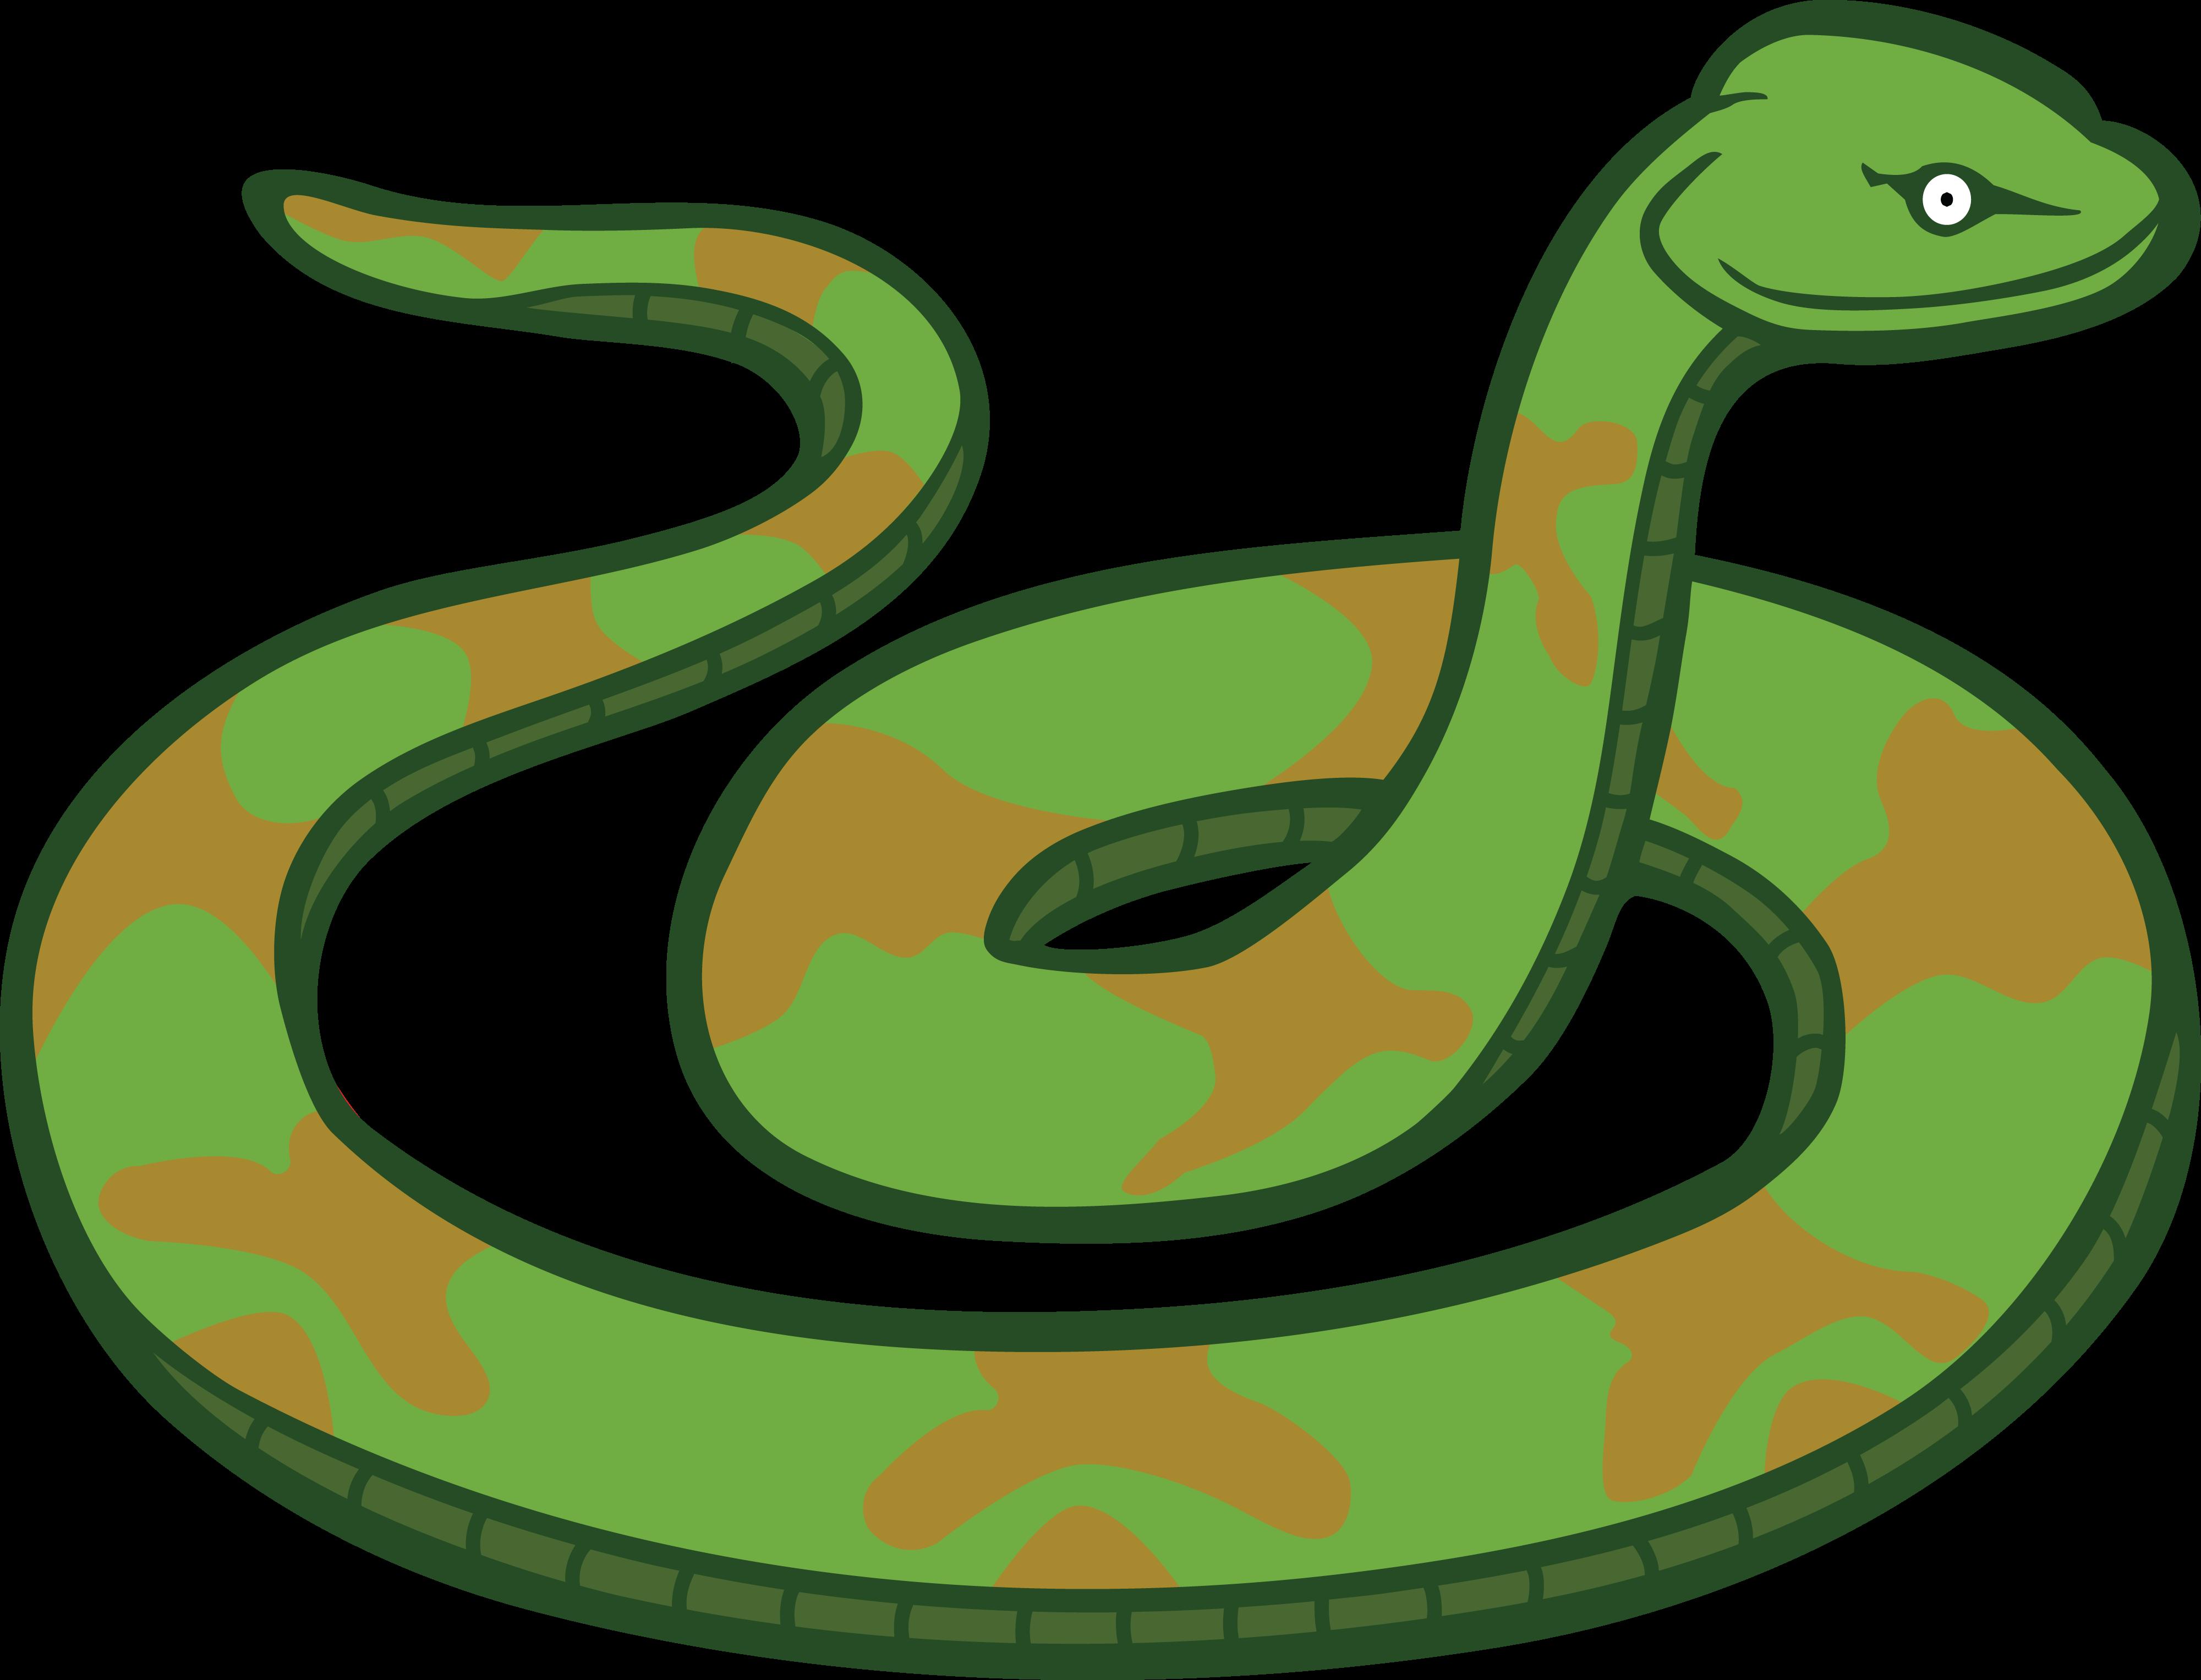 Kawaii clipart snake. Free jokingart com download